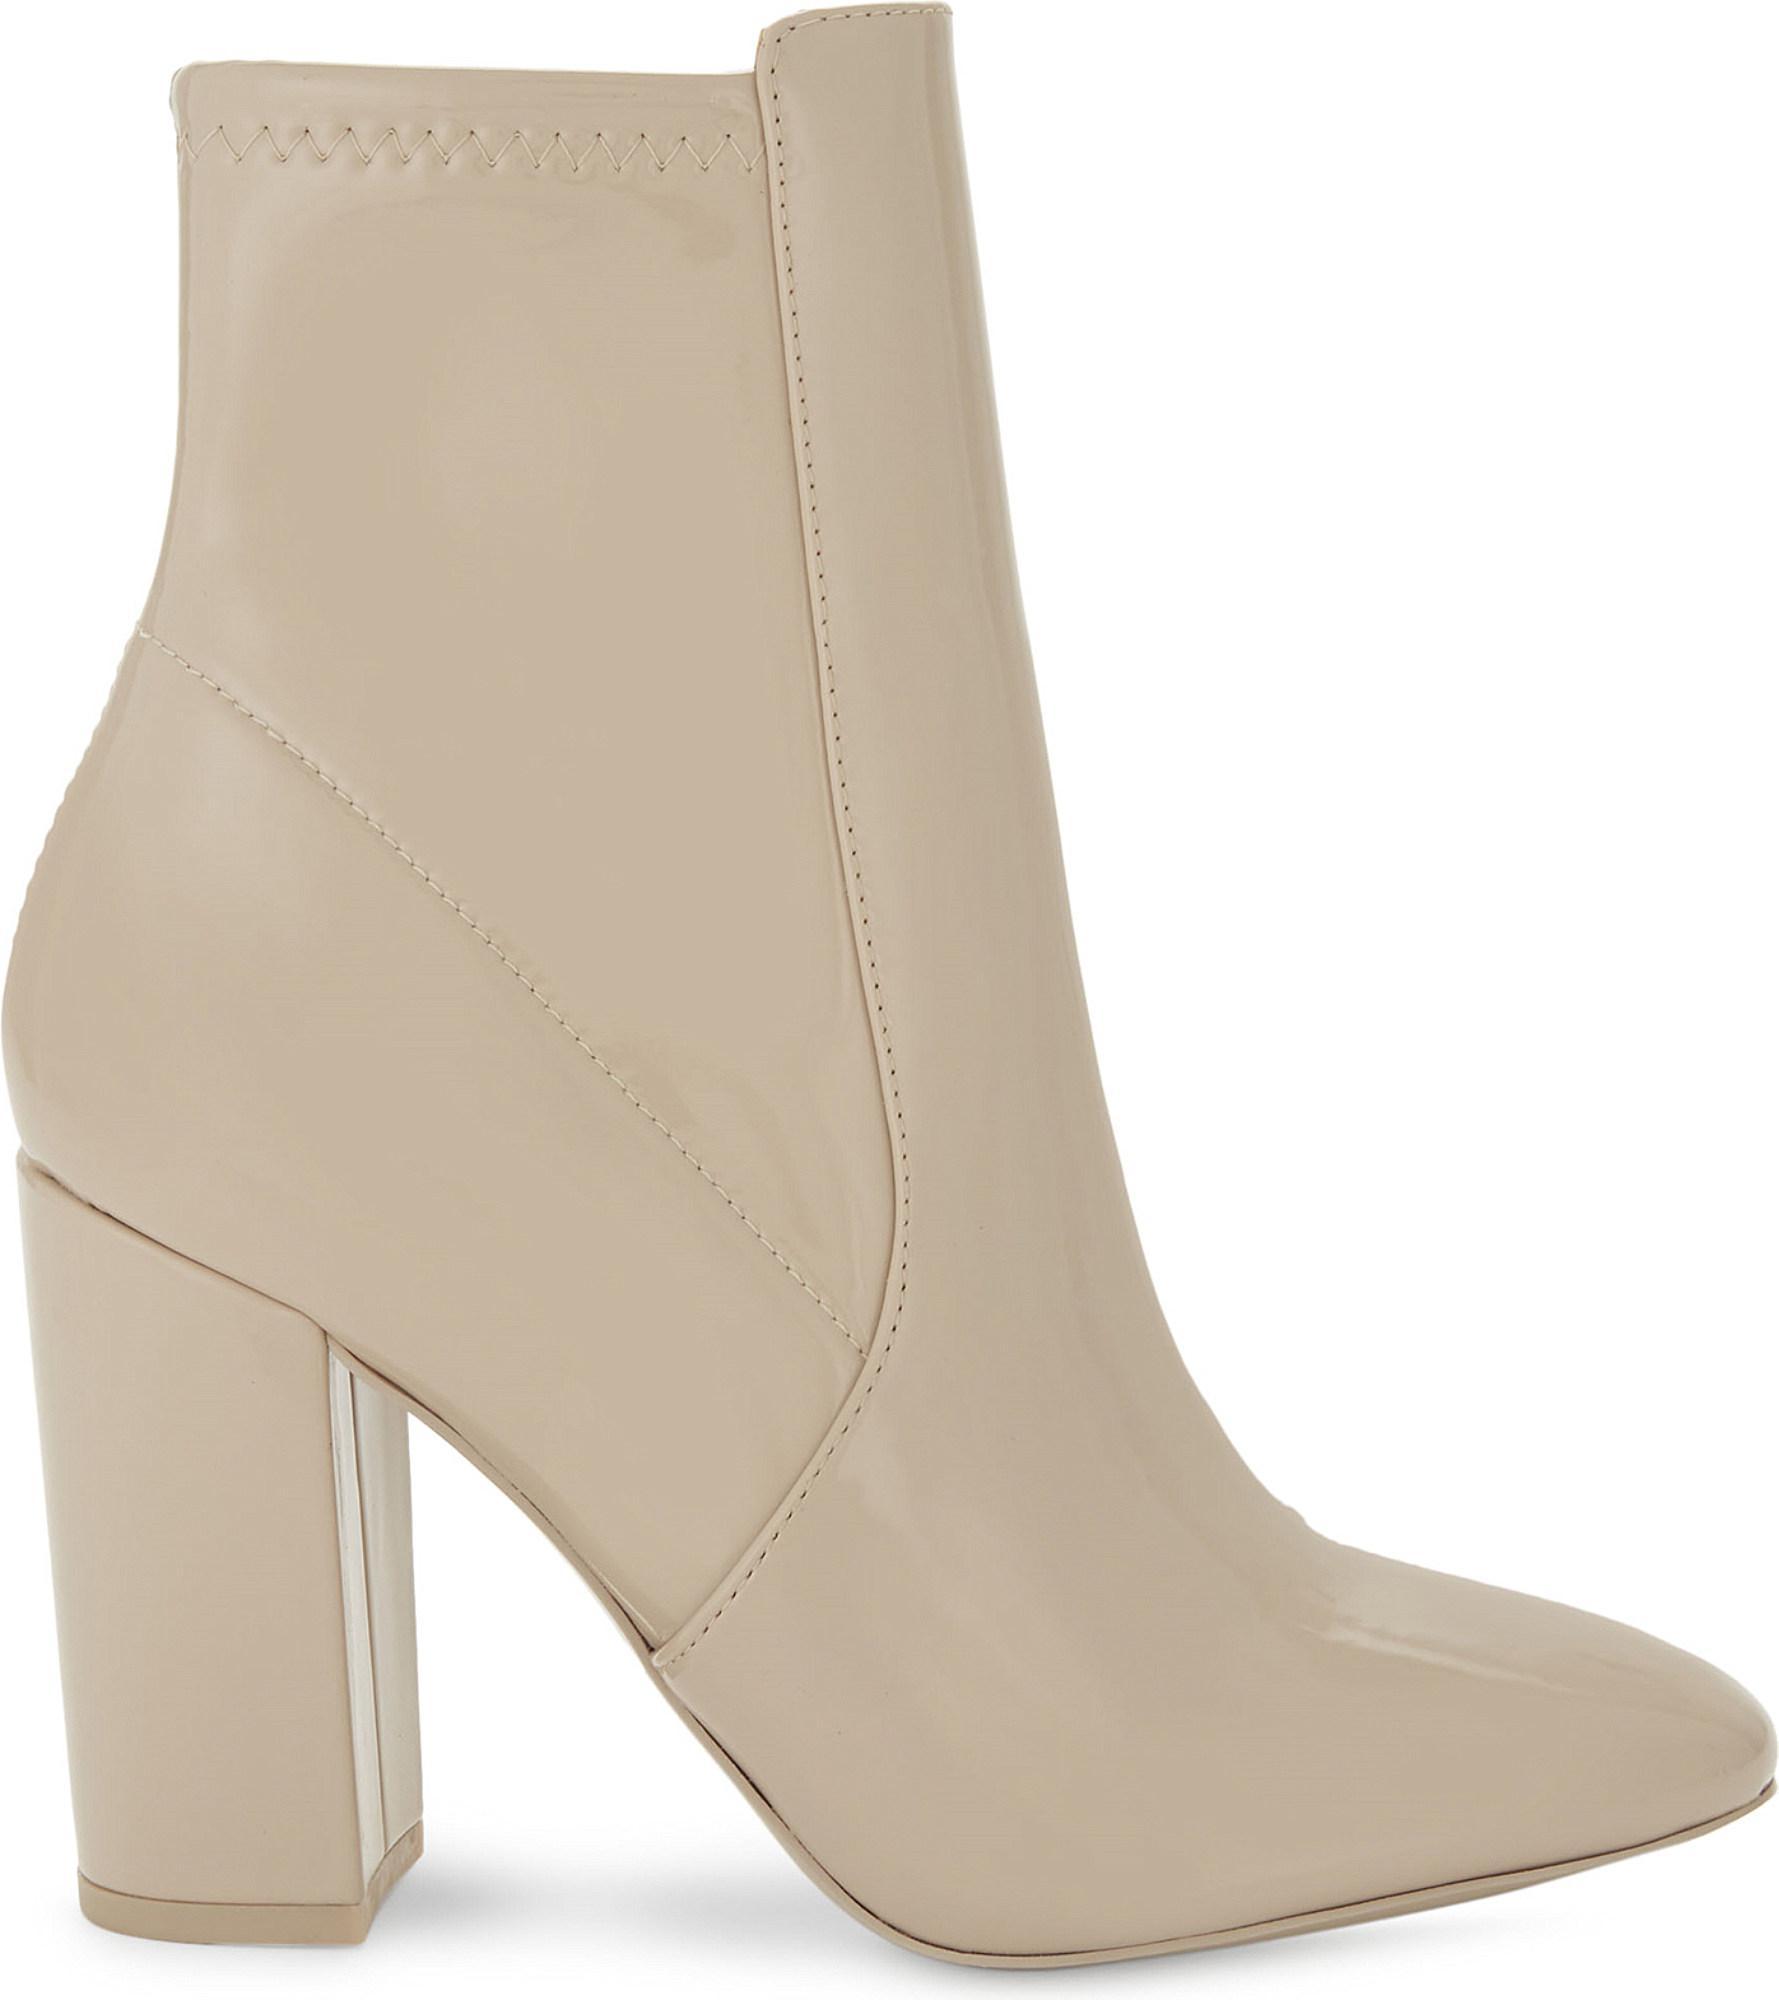 3187e985d05 Lyst - ALDO Aurella Patent Faux-leather Ankle Boots in Natural